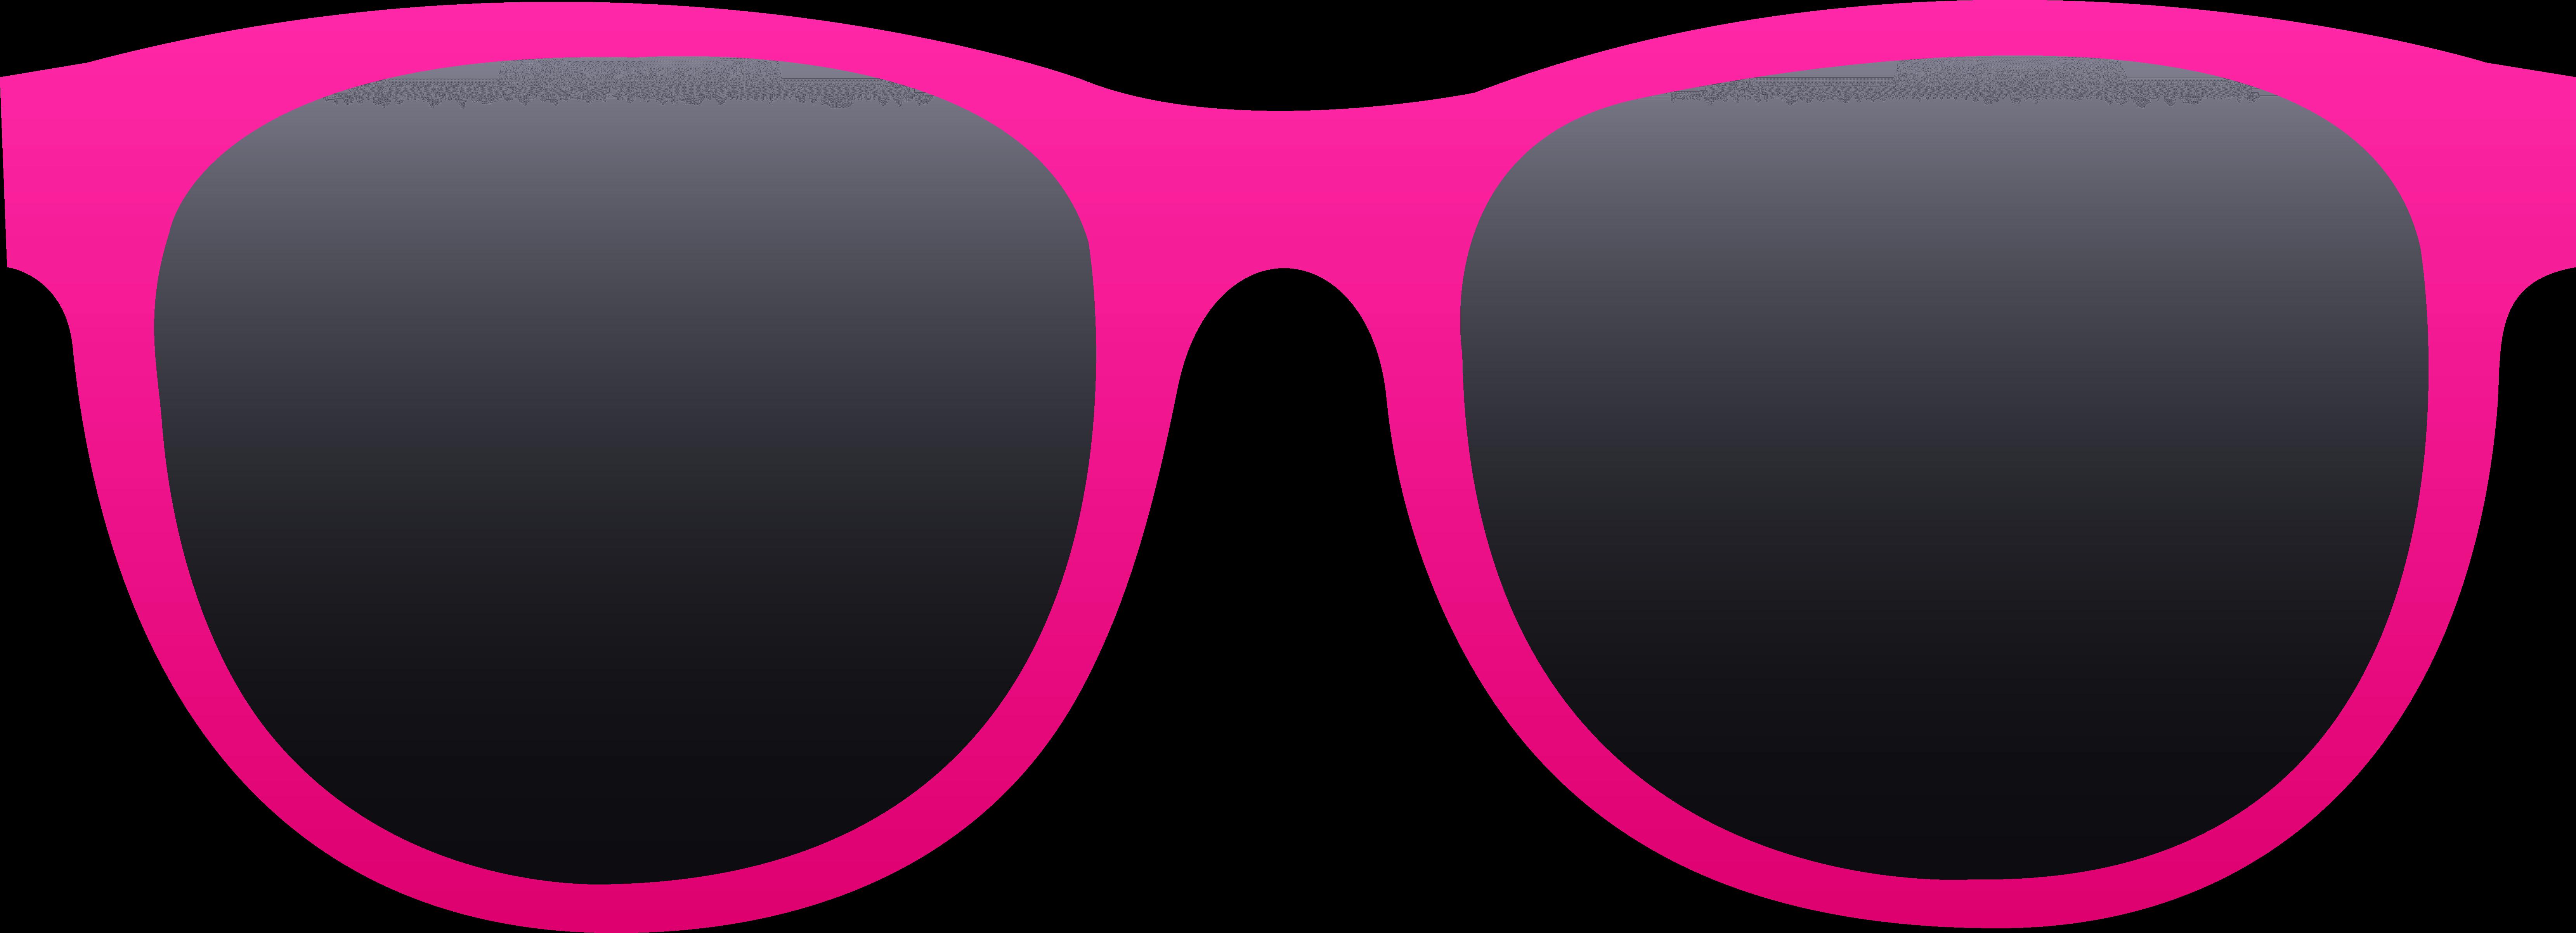 Girl glasses cliparts zone. Eyeglasses clipart nerd glass